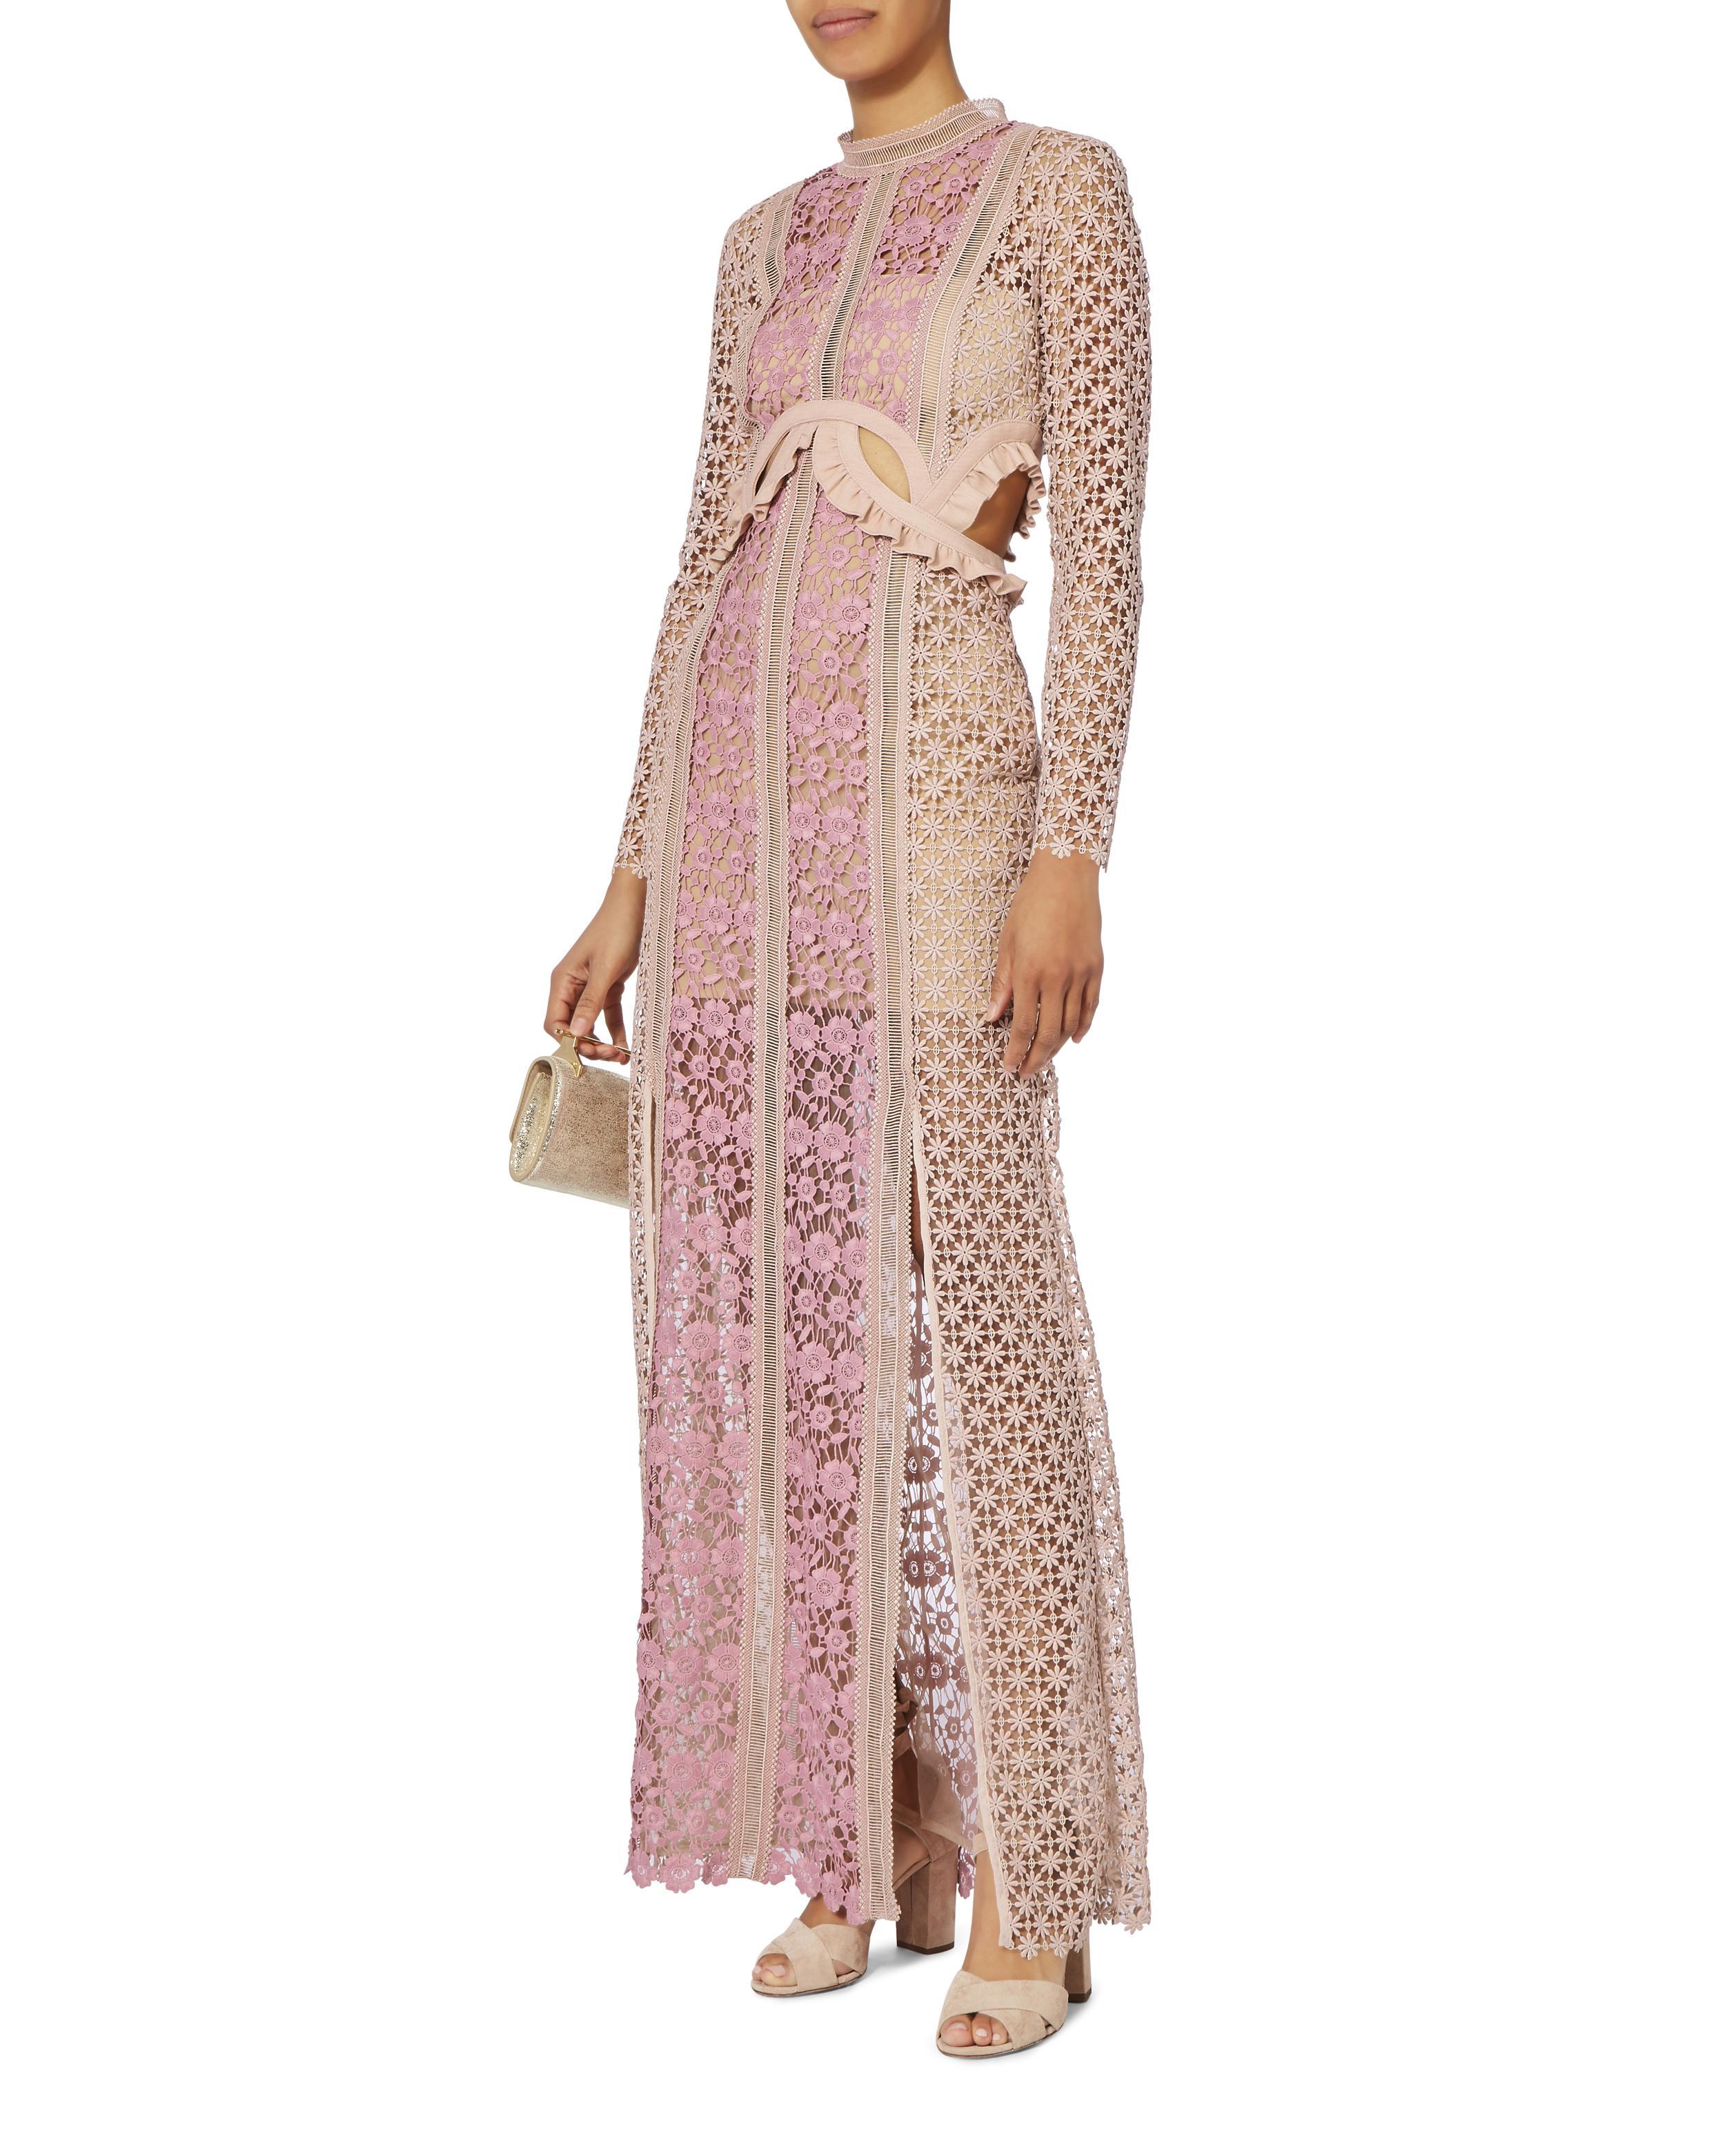 511146c0d5741 Self-Portrait Payne Cutout Maxi Dress - Lyst